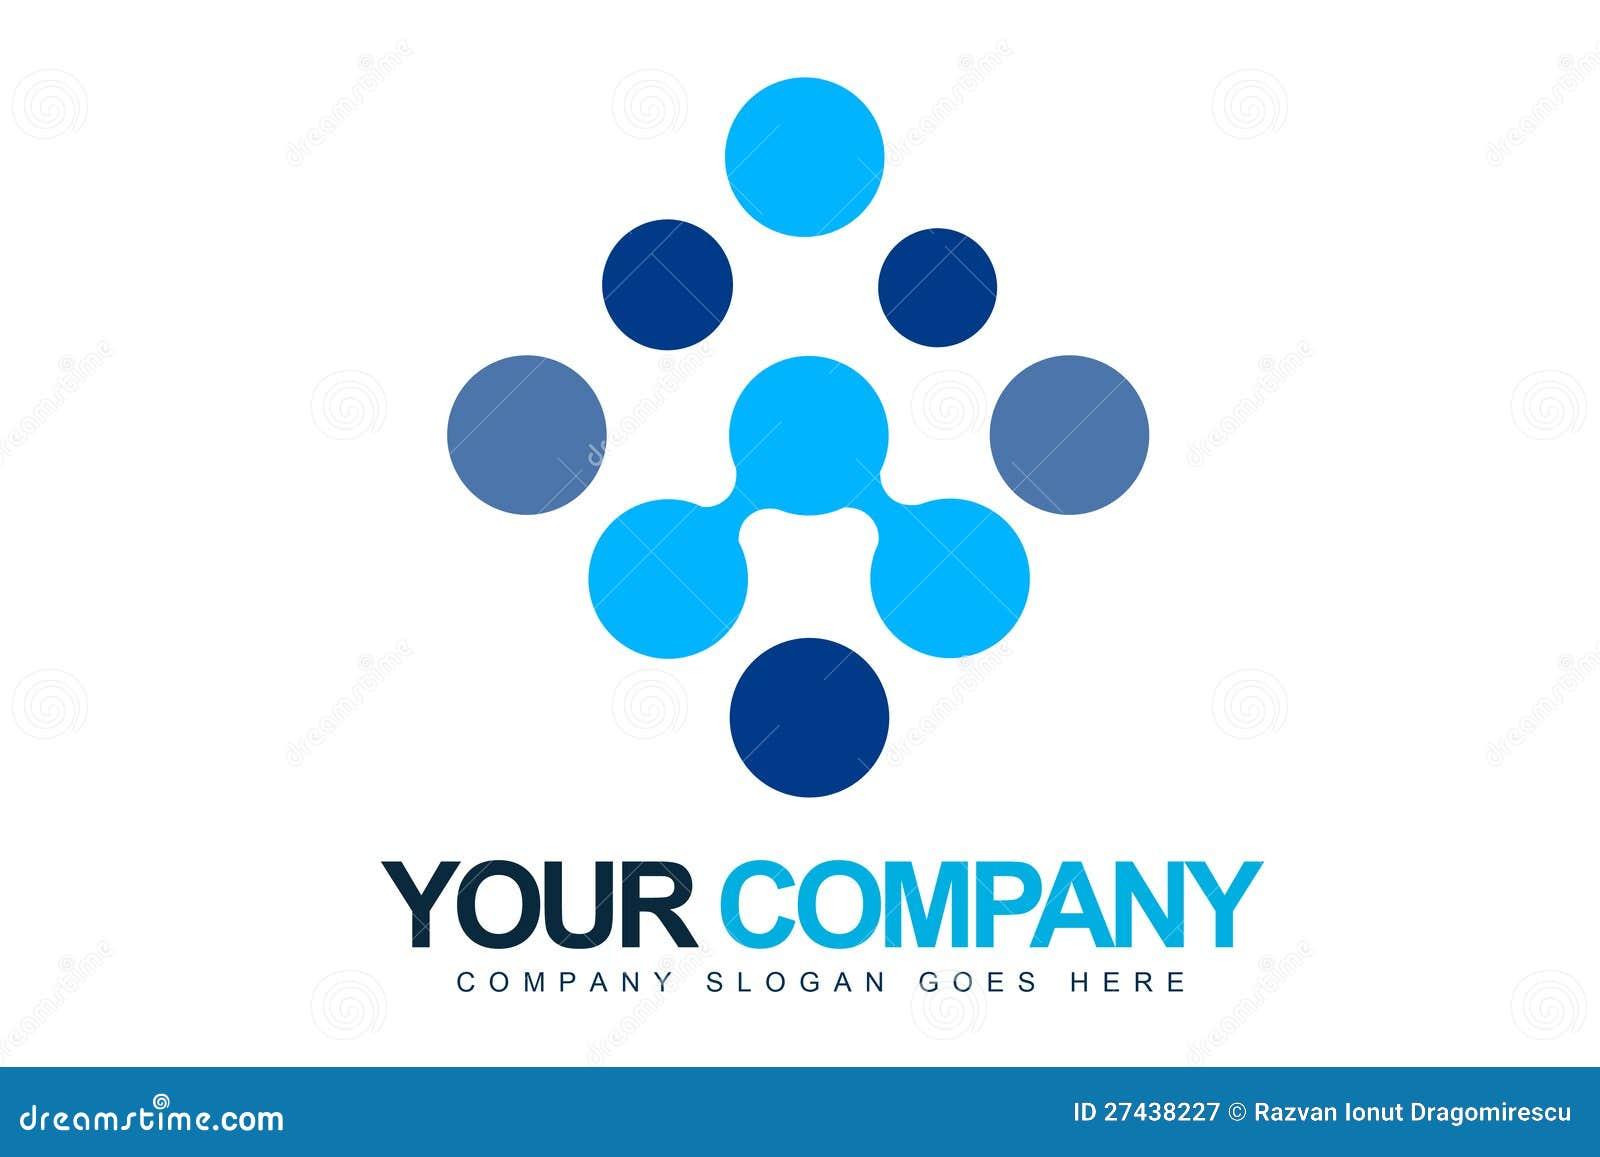 Critique logo for community consultancy - Graphic Design ...